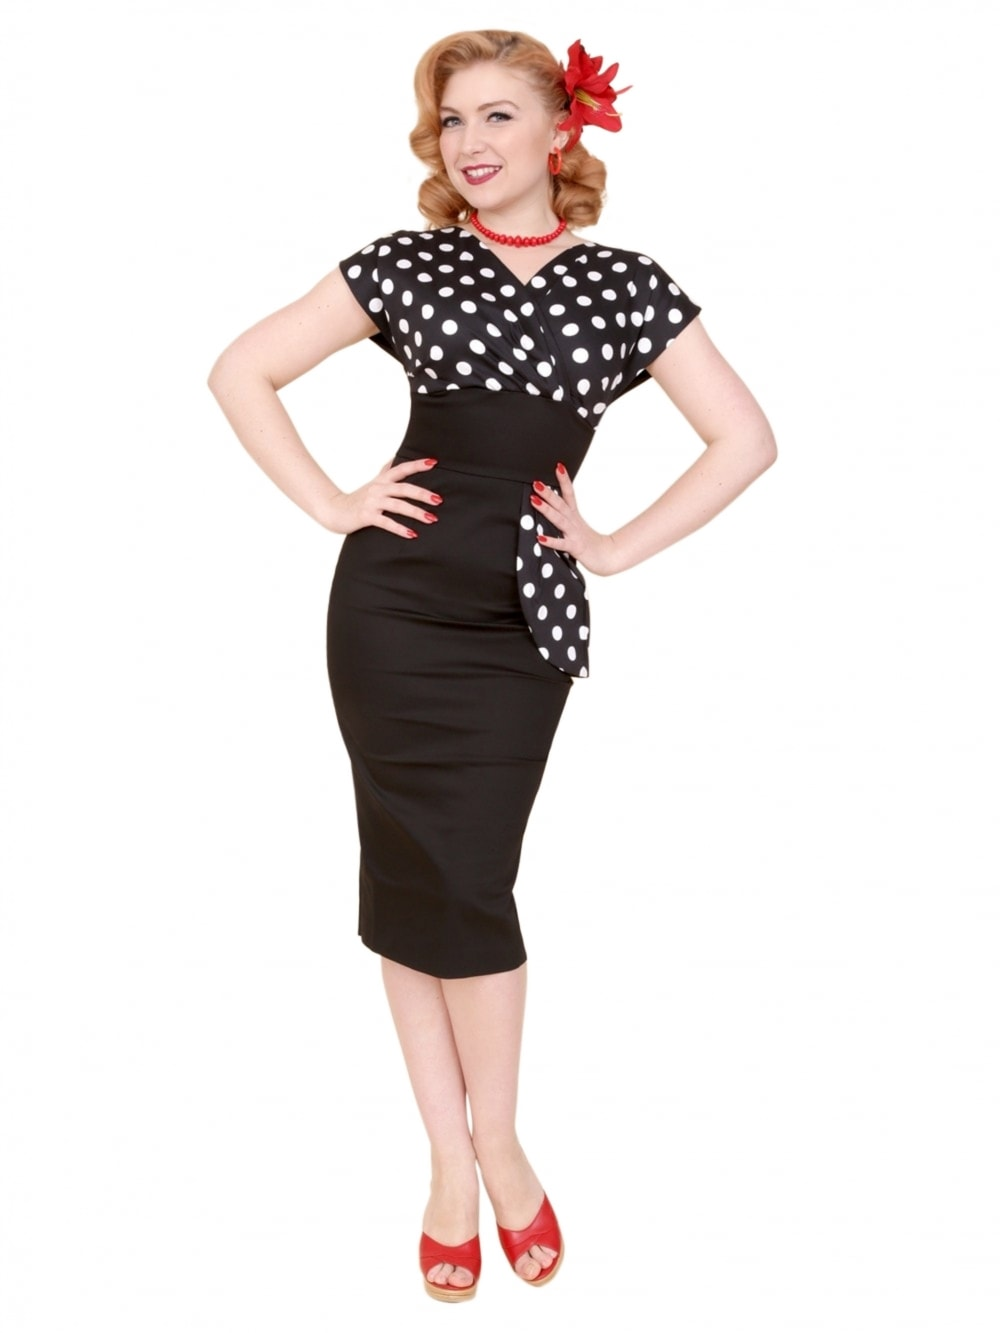 816236a720 Jezebel Black White Polka Bust Dress from Vivien Of Holloway